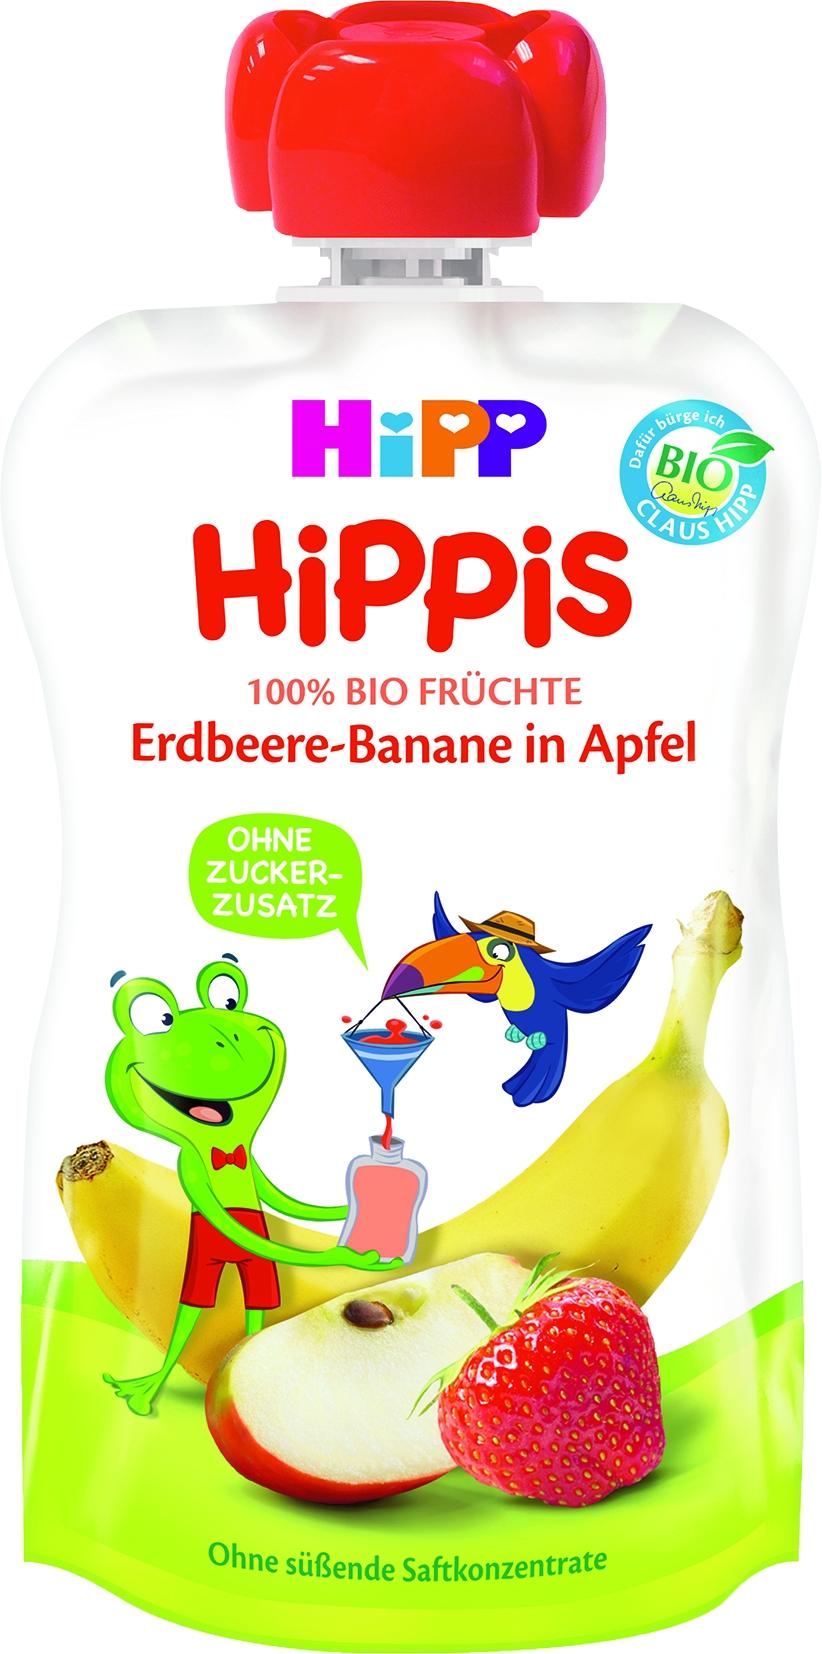 8521-01 Hippis Erdbeer/Banane/Apfel